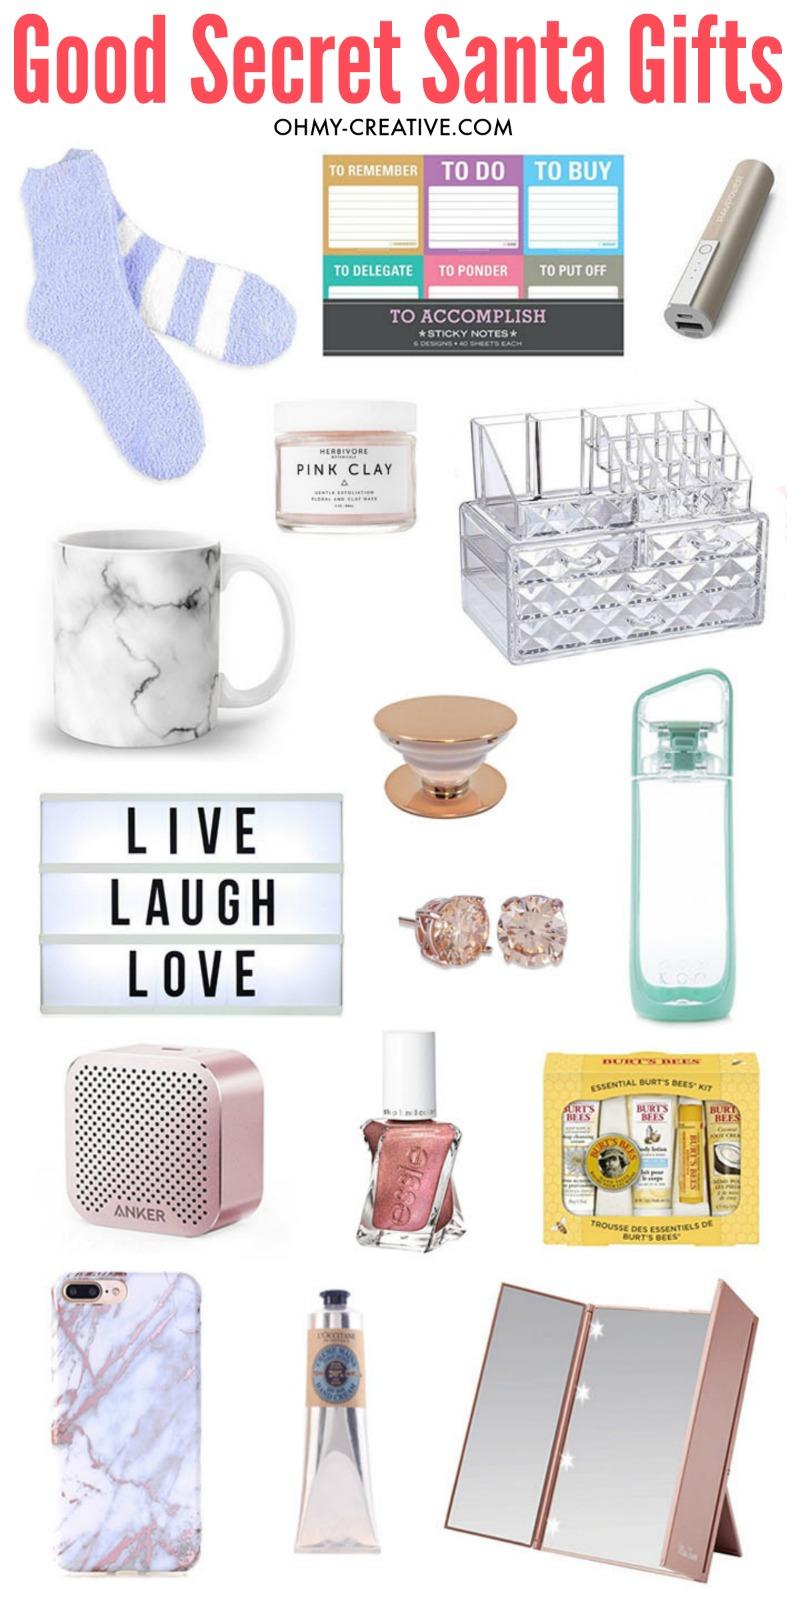 Good Secret Santa Gifts | OHMY CREATIVE.COM Best Secret Santa Gifts | Cheap